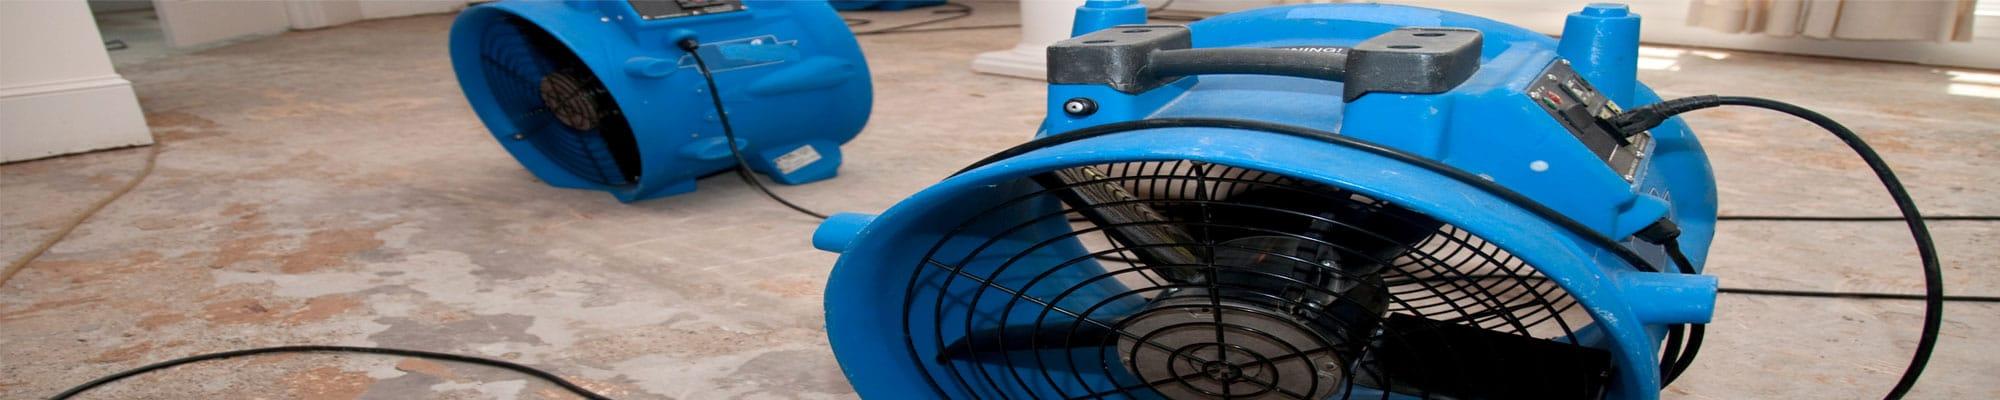 commercial-grade-drying-equipment